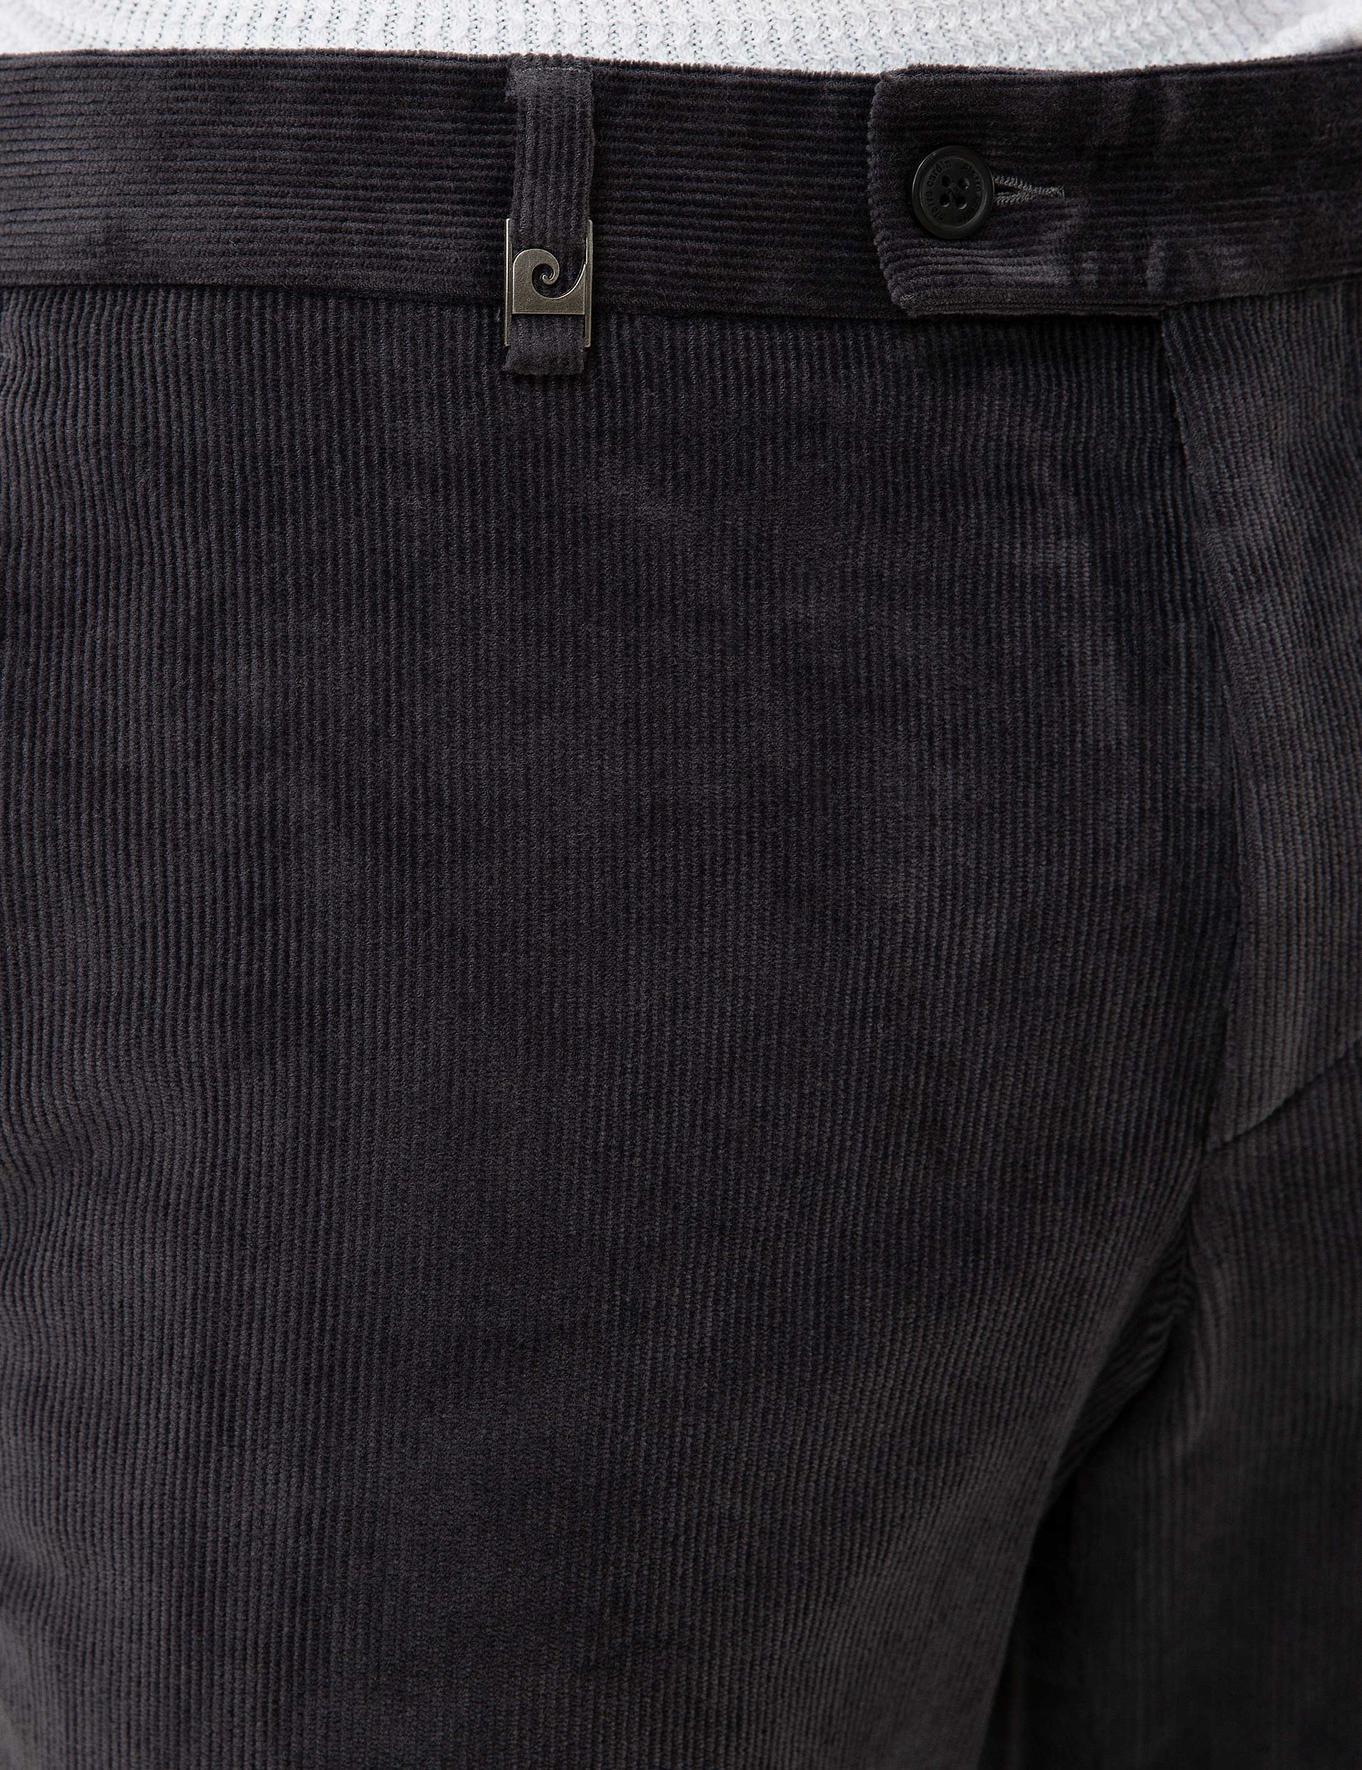 Füme Slim Fit Kadife Pantolon